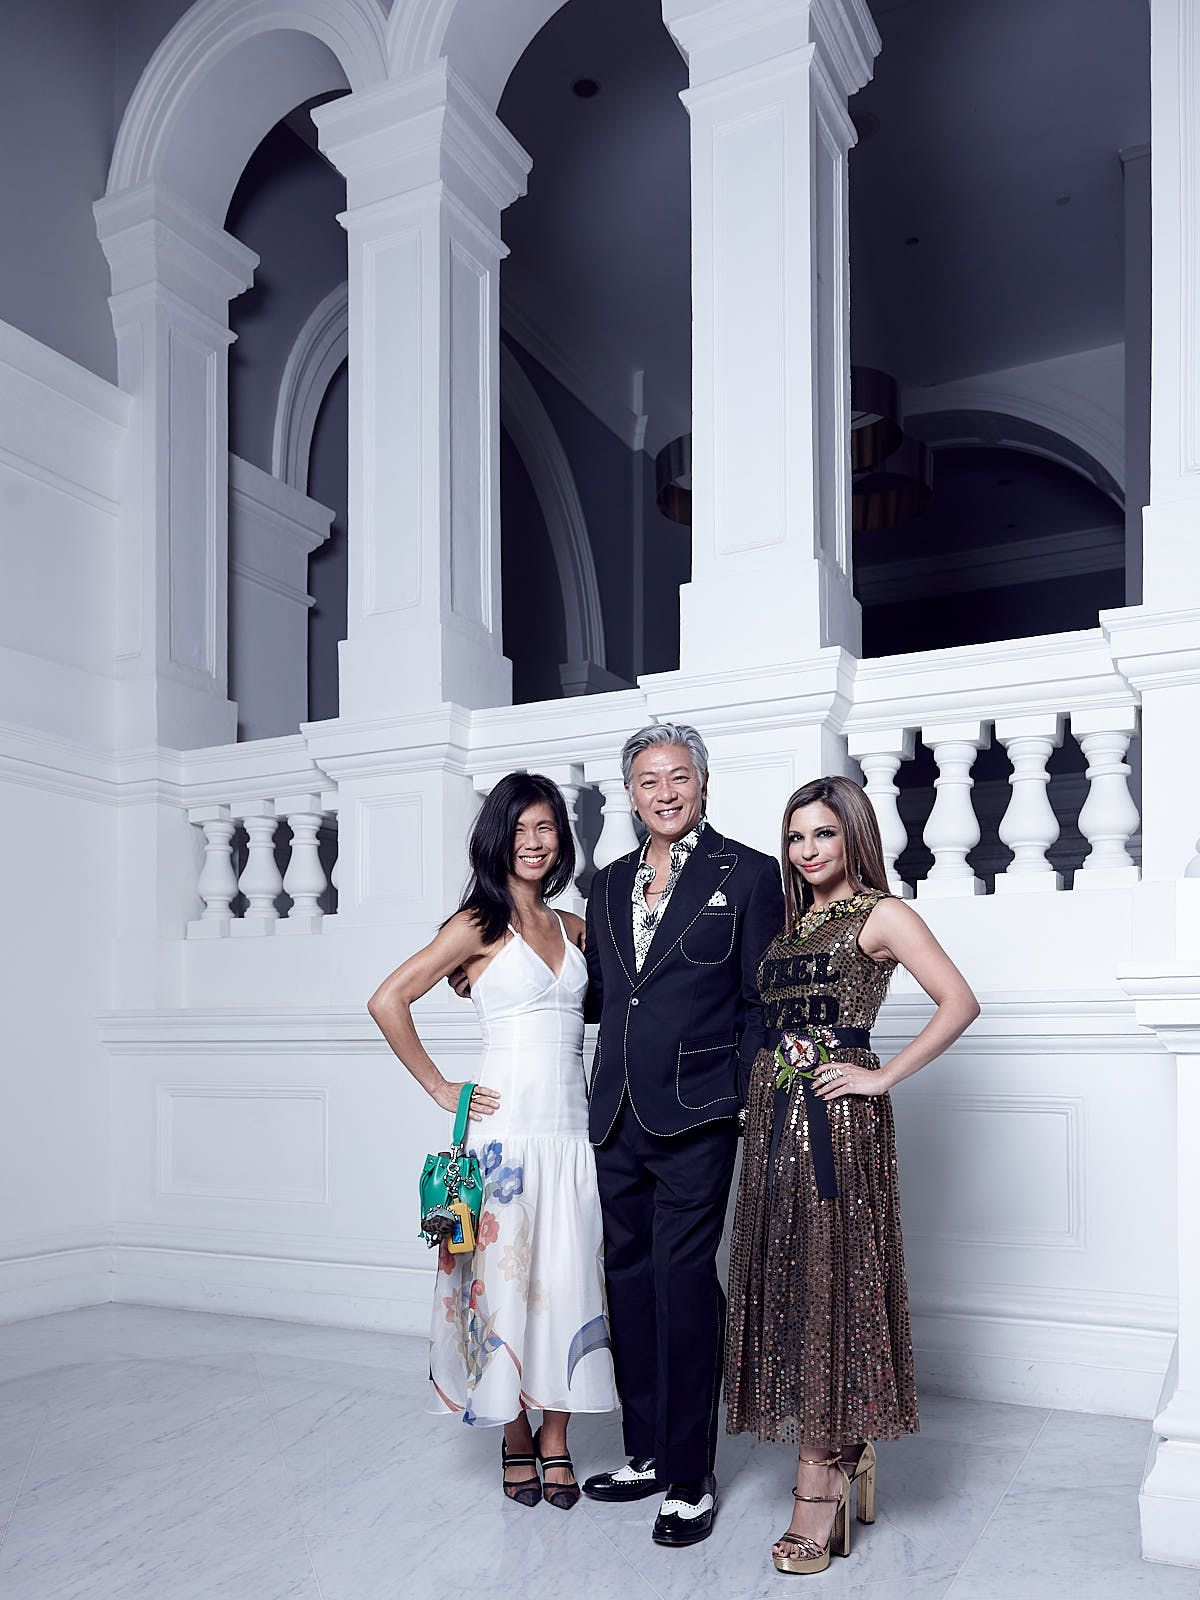 Clara Goh in Fendi, Dick Lee, Rasina Rubin in Dolce & Gabbana